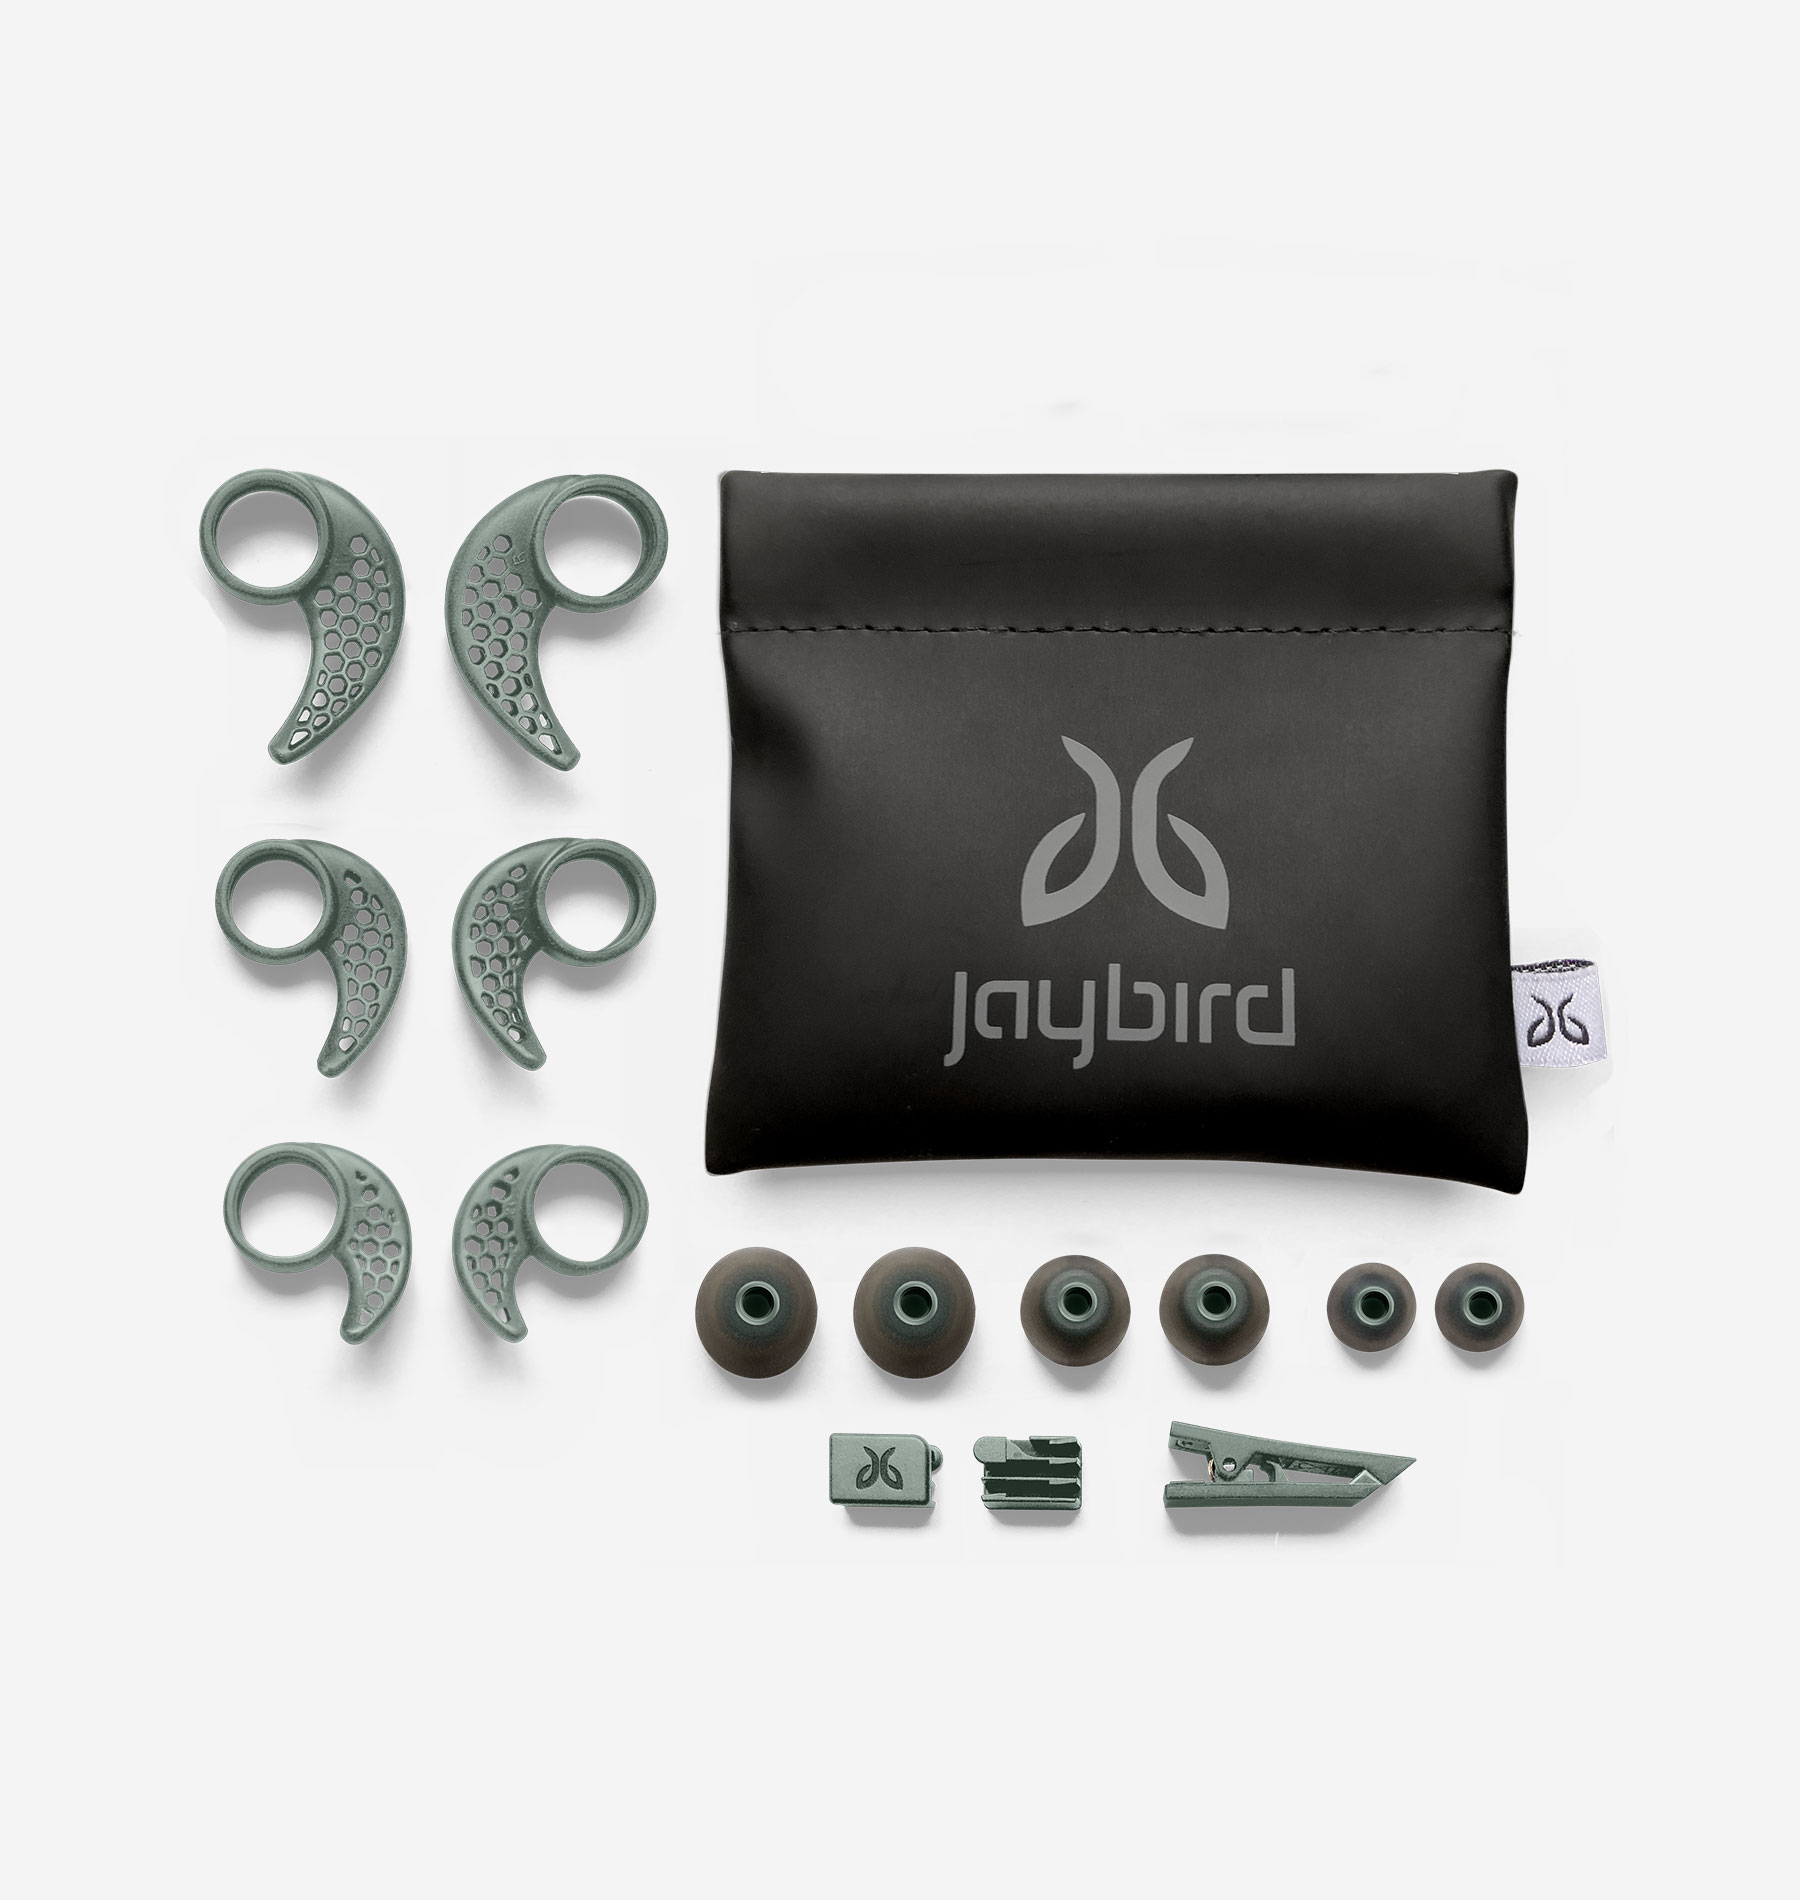 Jaybird X4 Accessory Pack